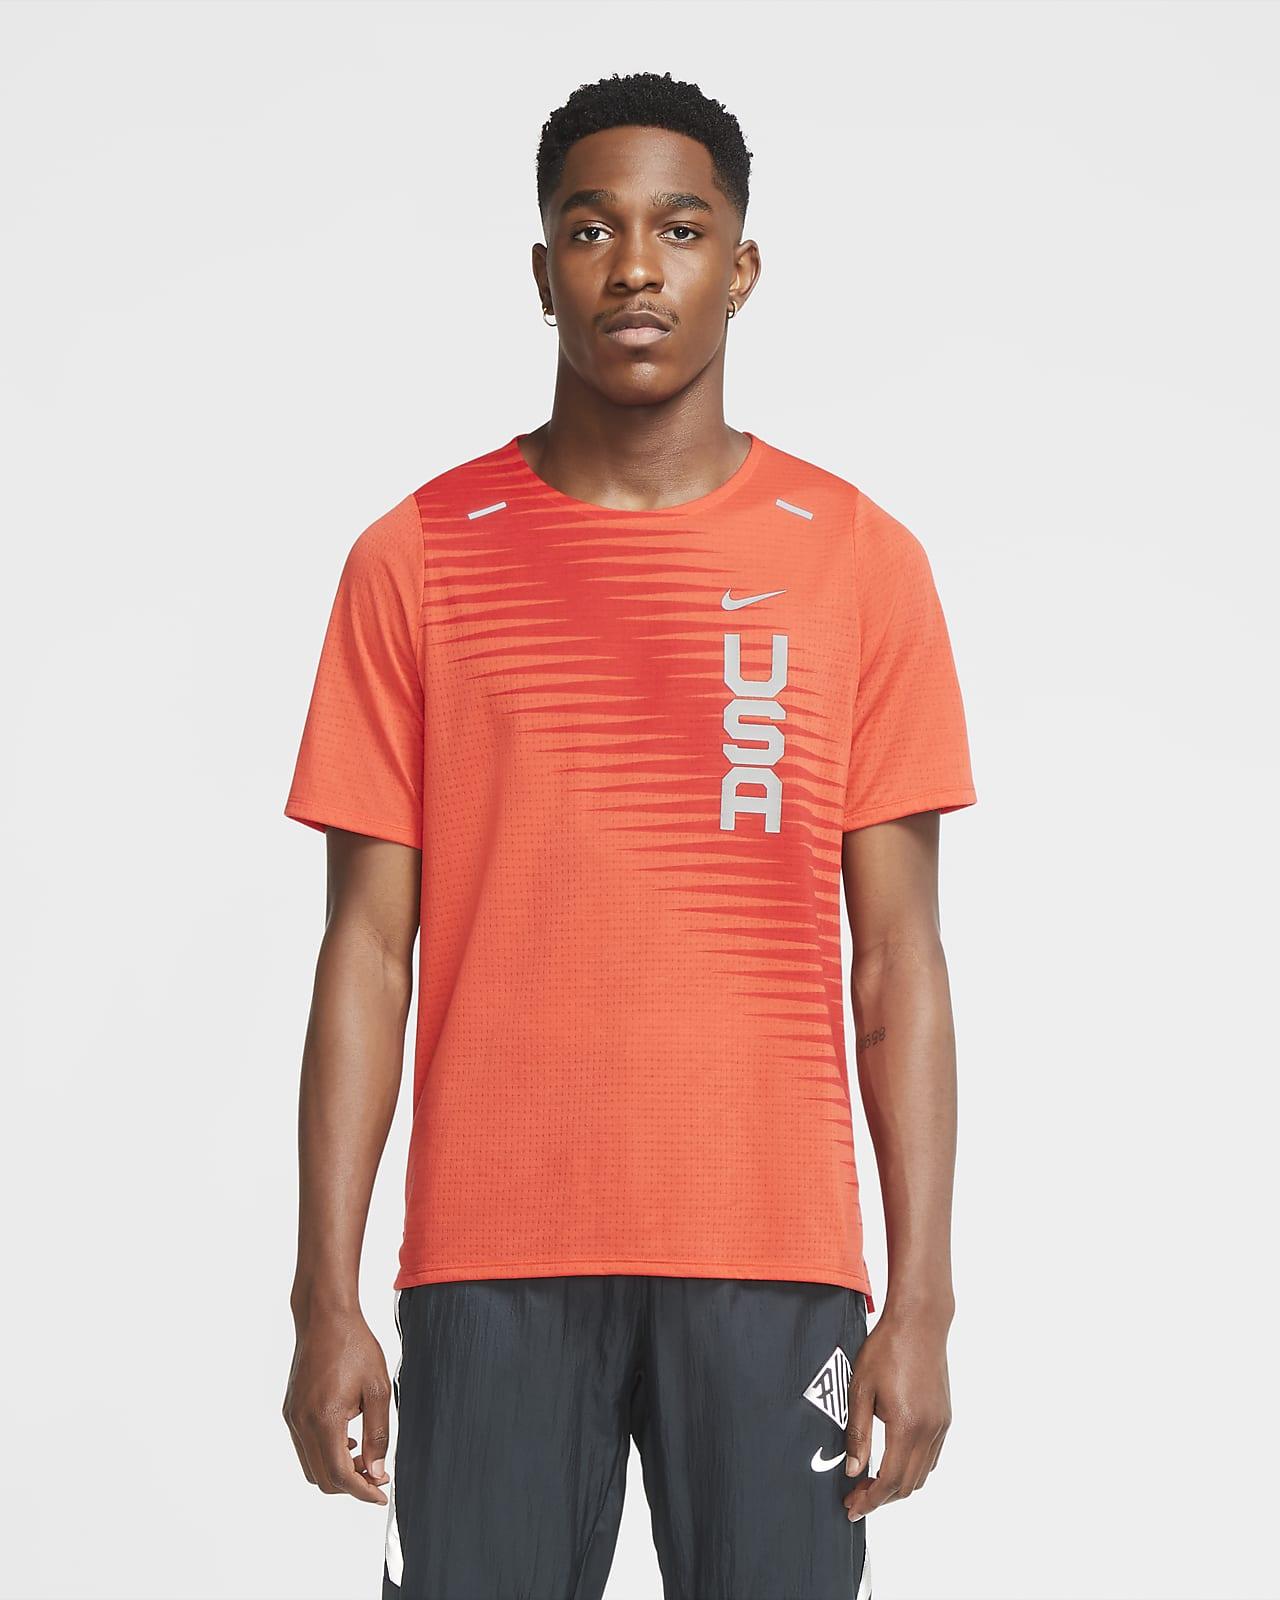 Nike Dri-FIT Team USA Rise 365 Men's Short-Sleeve Running Top